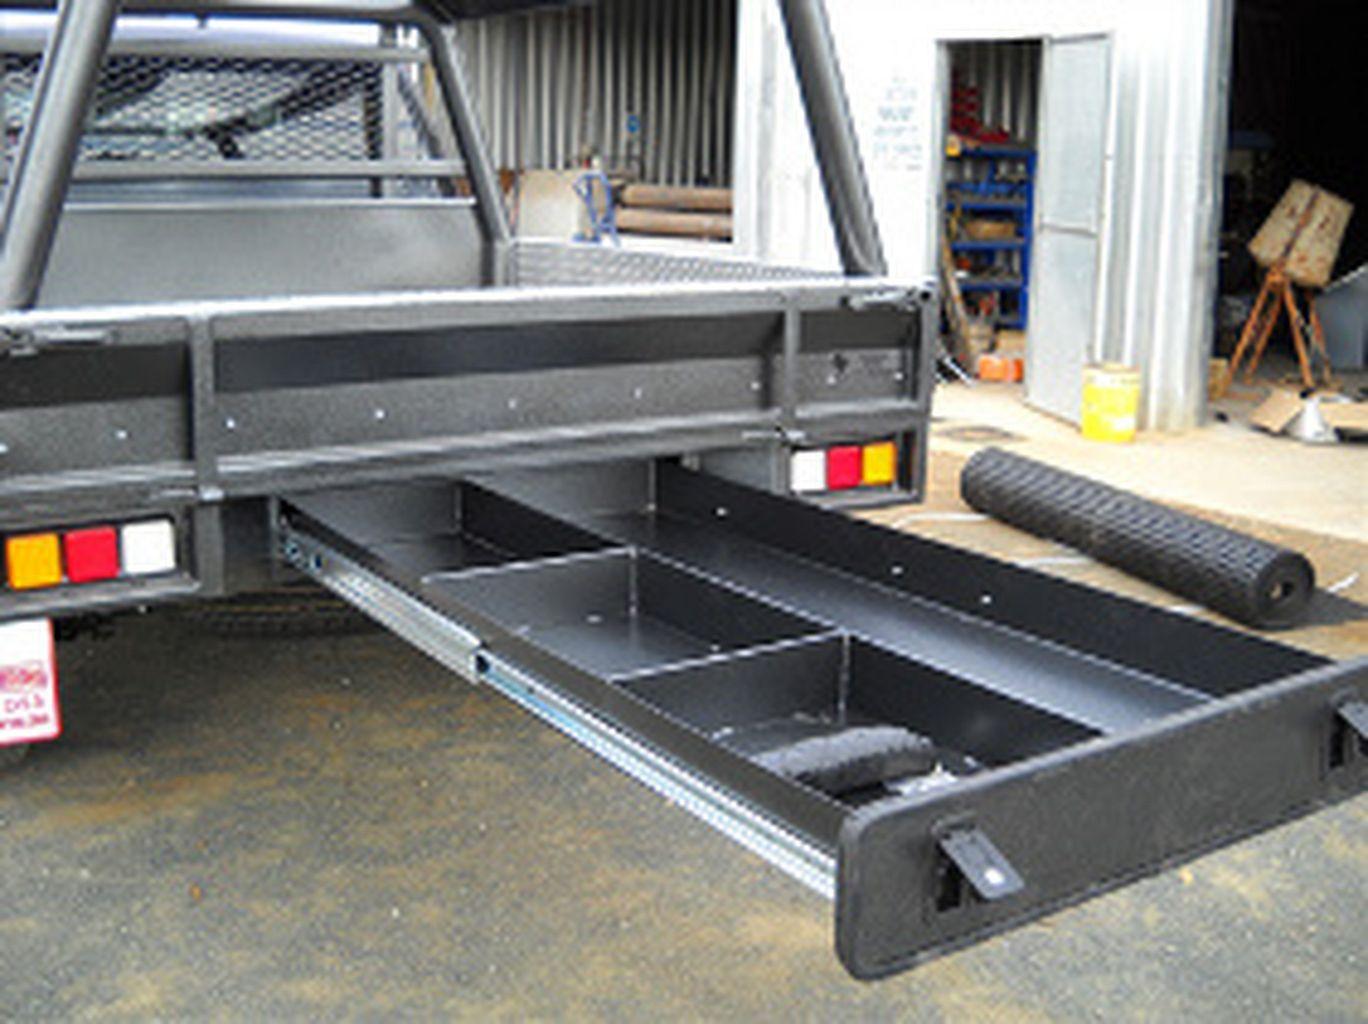 Flatbed Truck Ideas 7 Truck Project Ideas Truck tools